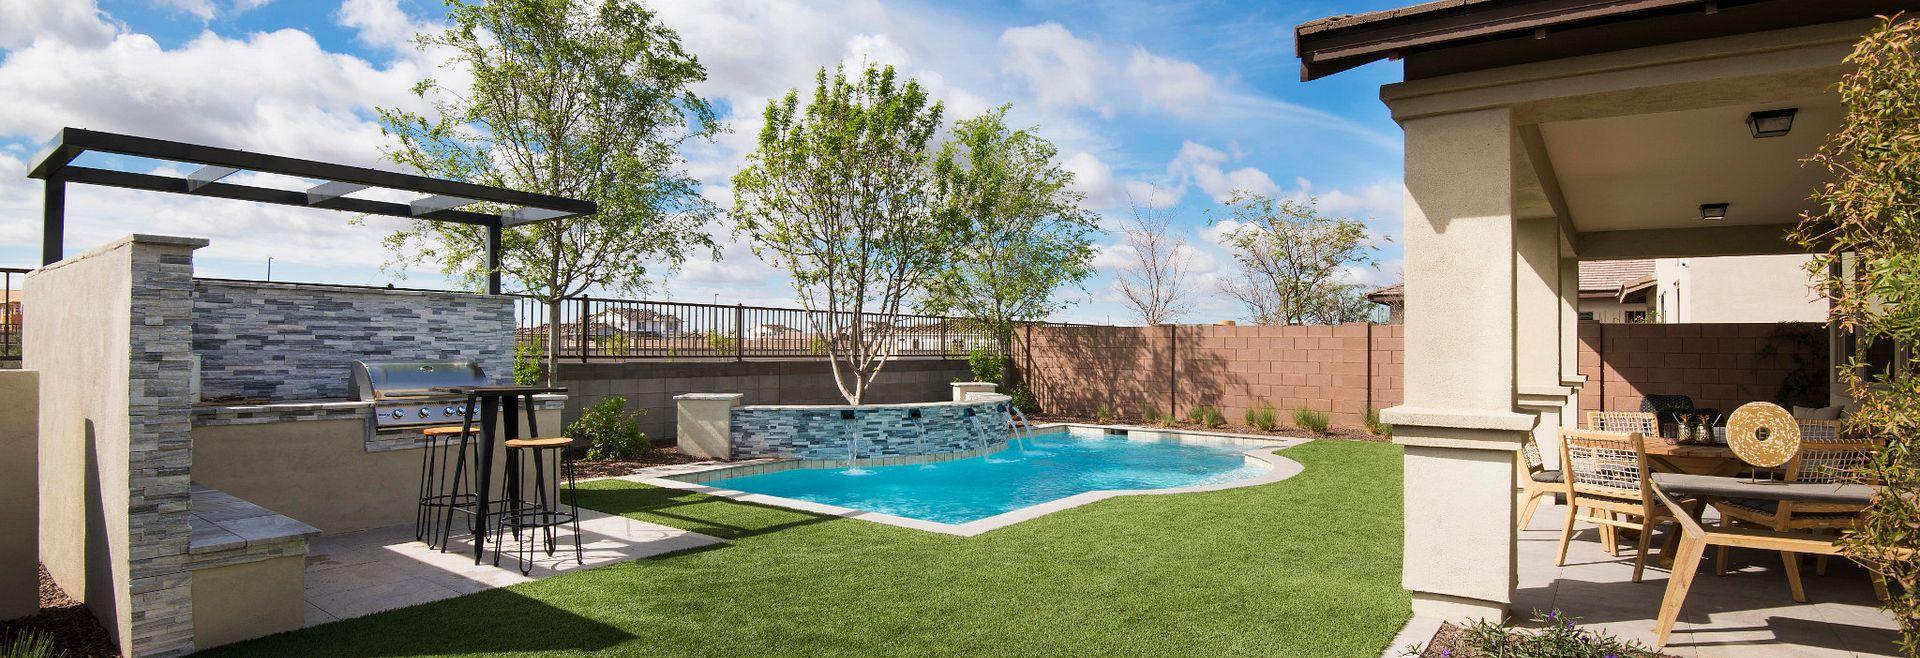 Spark Plan Backyard